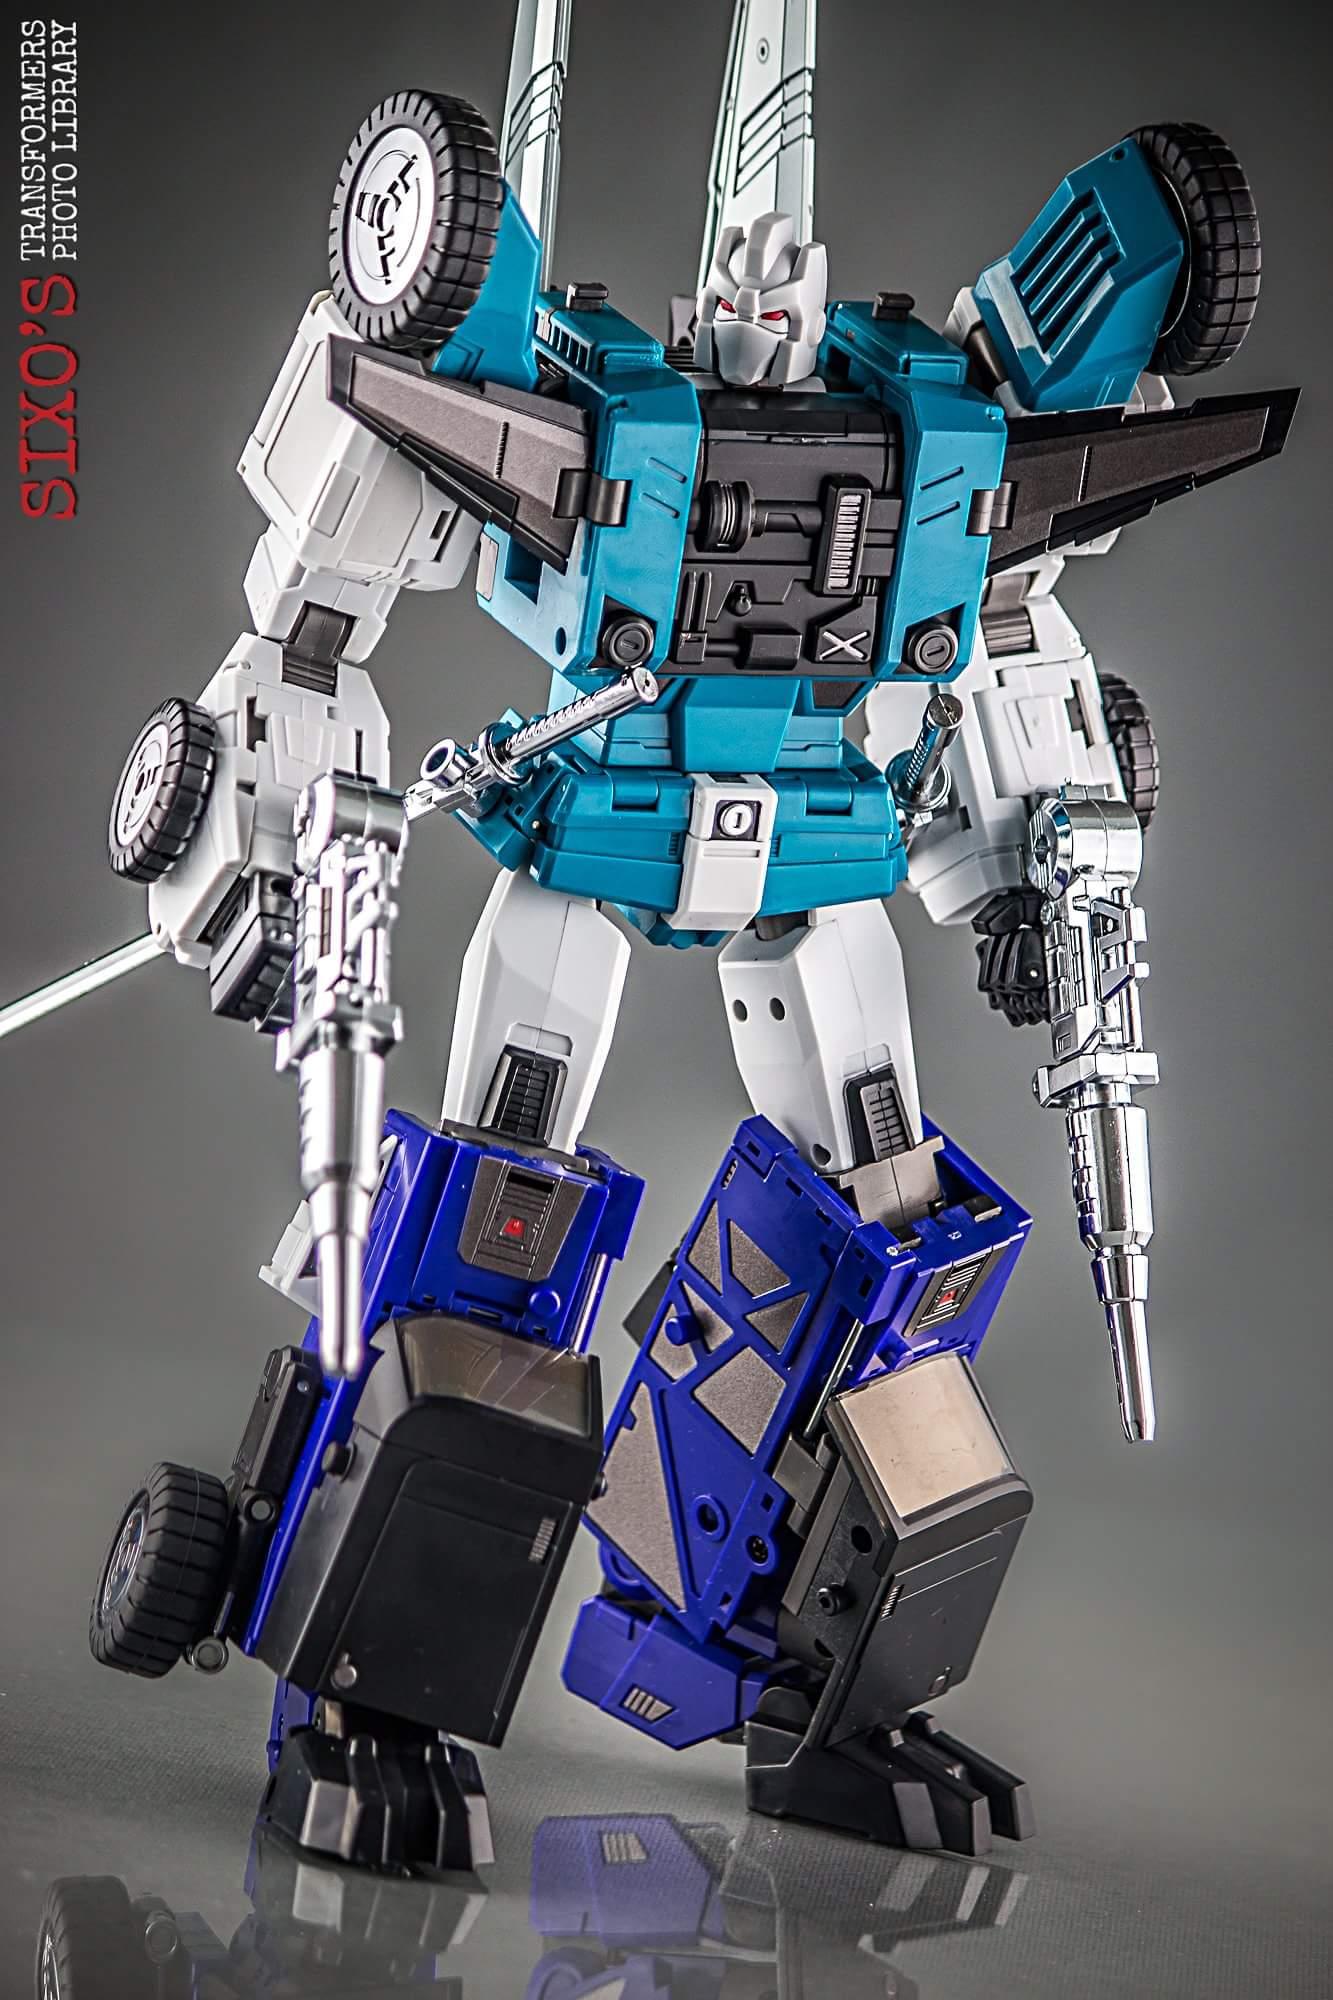 [DX9 Toys] Produit Tiers - Jouet D10 Hanzo - aka Sixshot/Hexabot - Page 2 SpMM3aM4